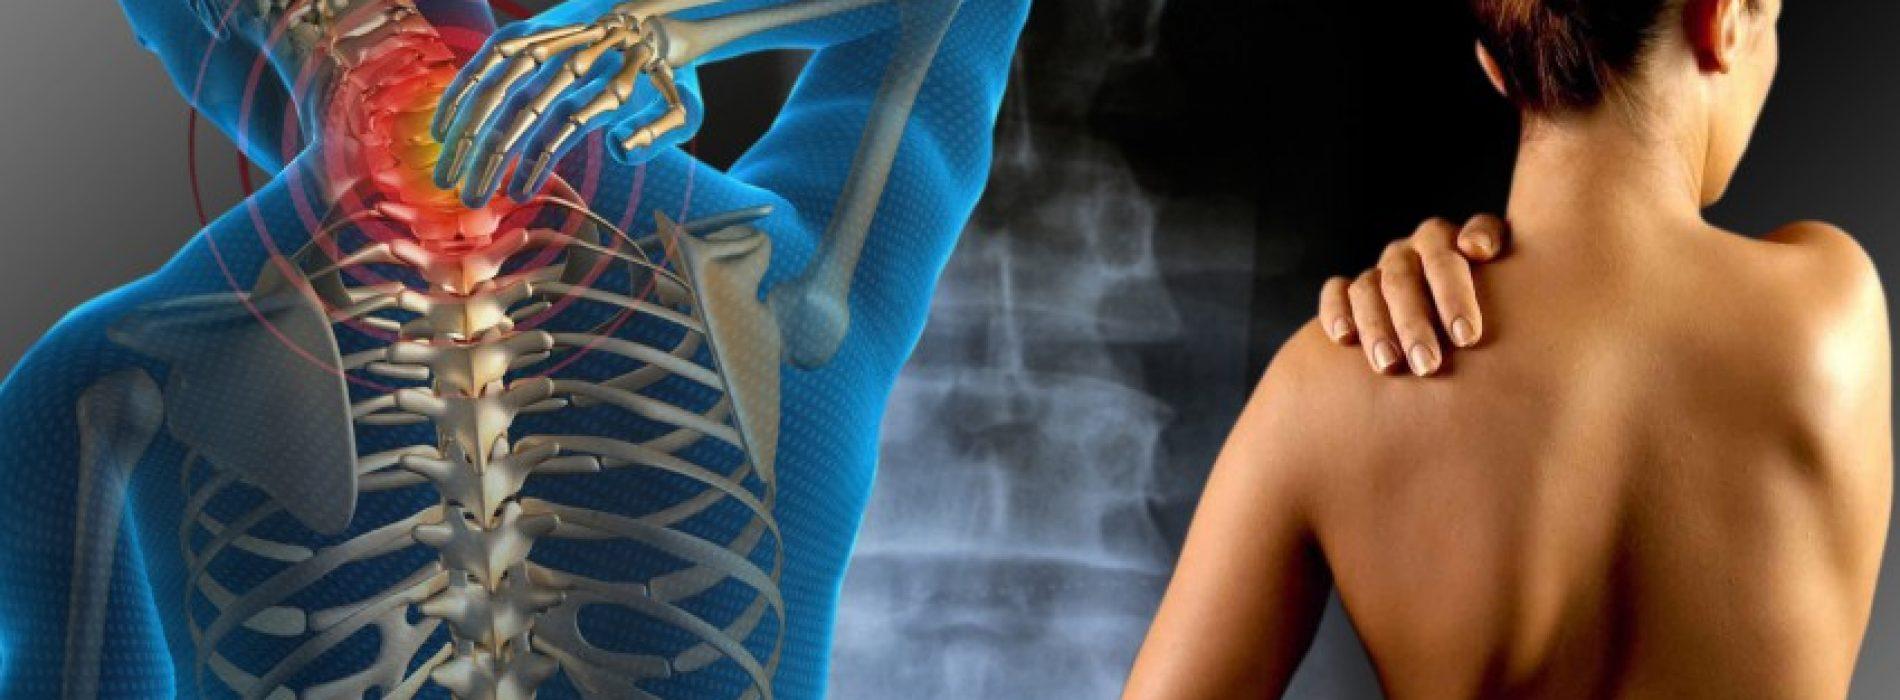 Fibromyalgie patiënten hebben lagere botdichtheid